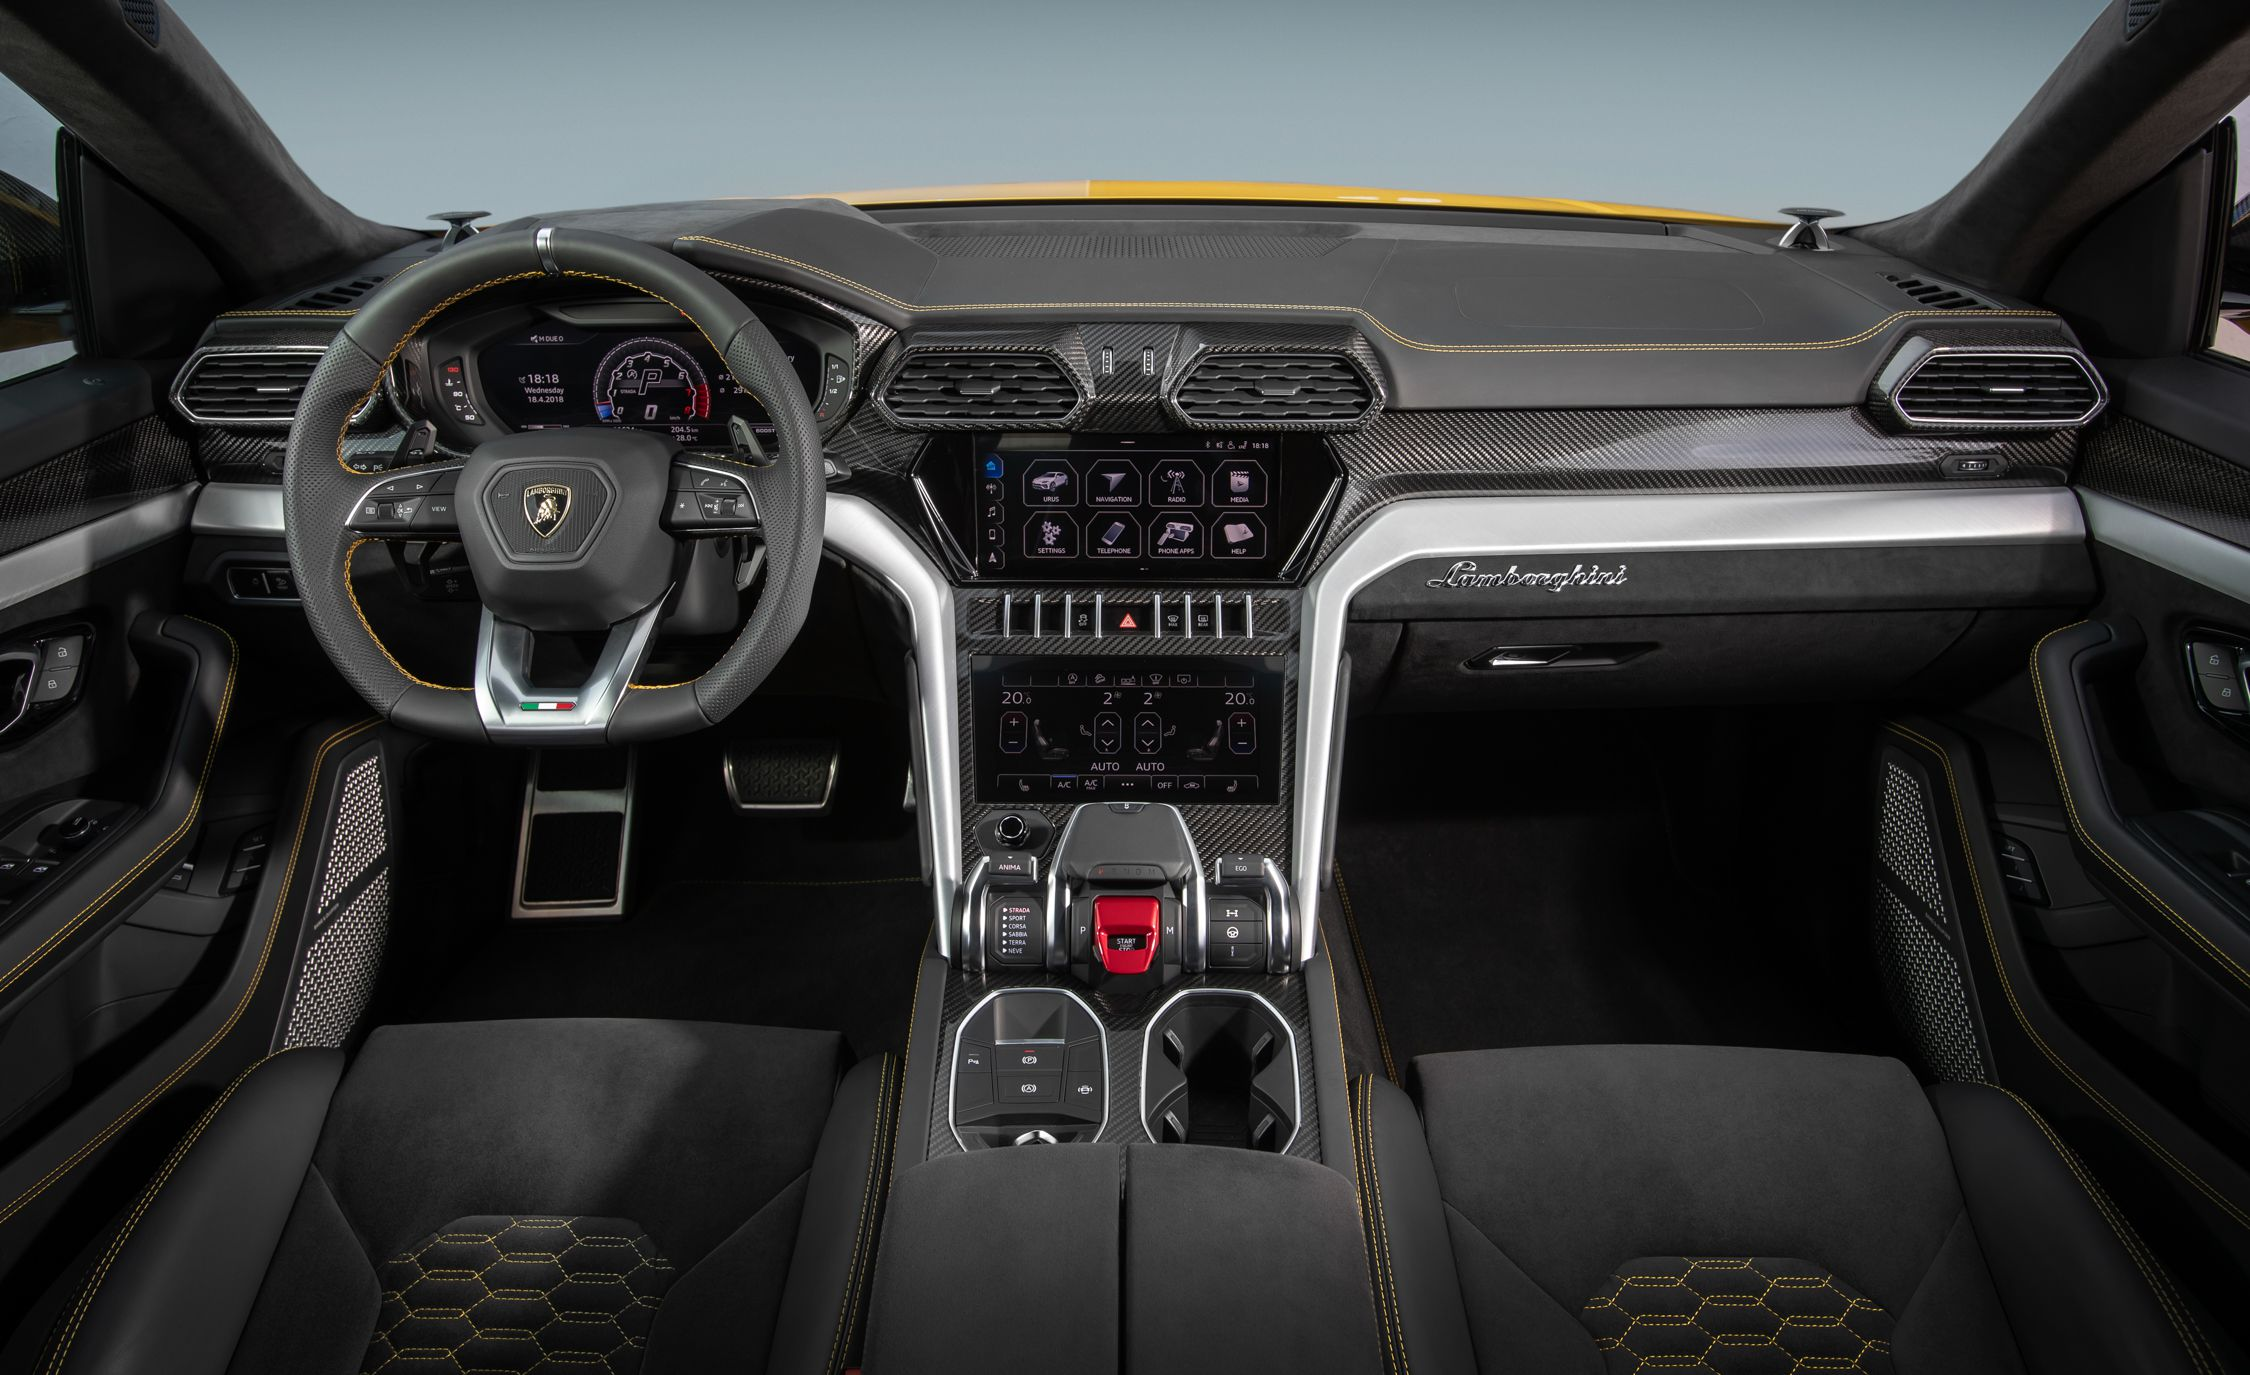 2019 Lamborghini Urus Interior Cockpit Wallpaper 28 Hd Wallpapers